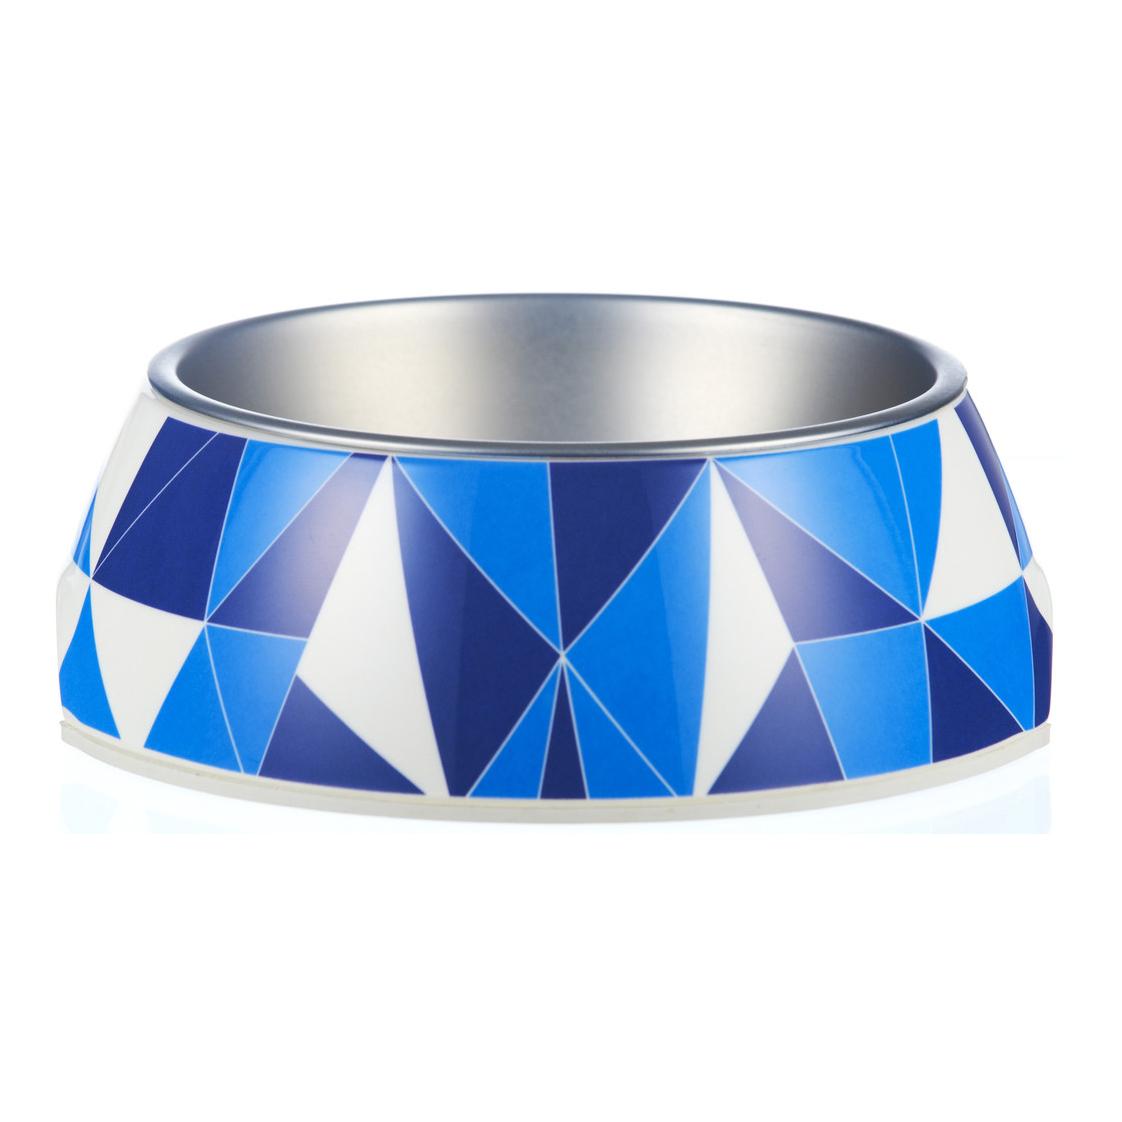 Gummi Pets Federation Dog Bowl Blue | The Design Gift Shop